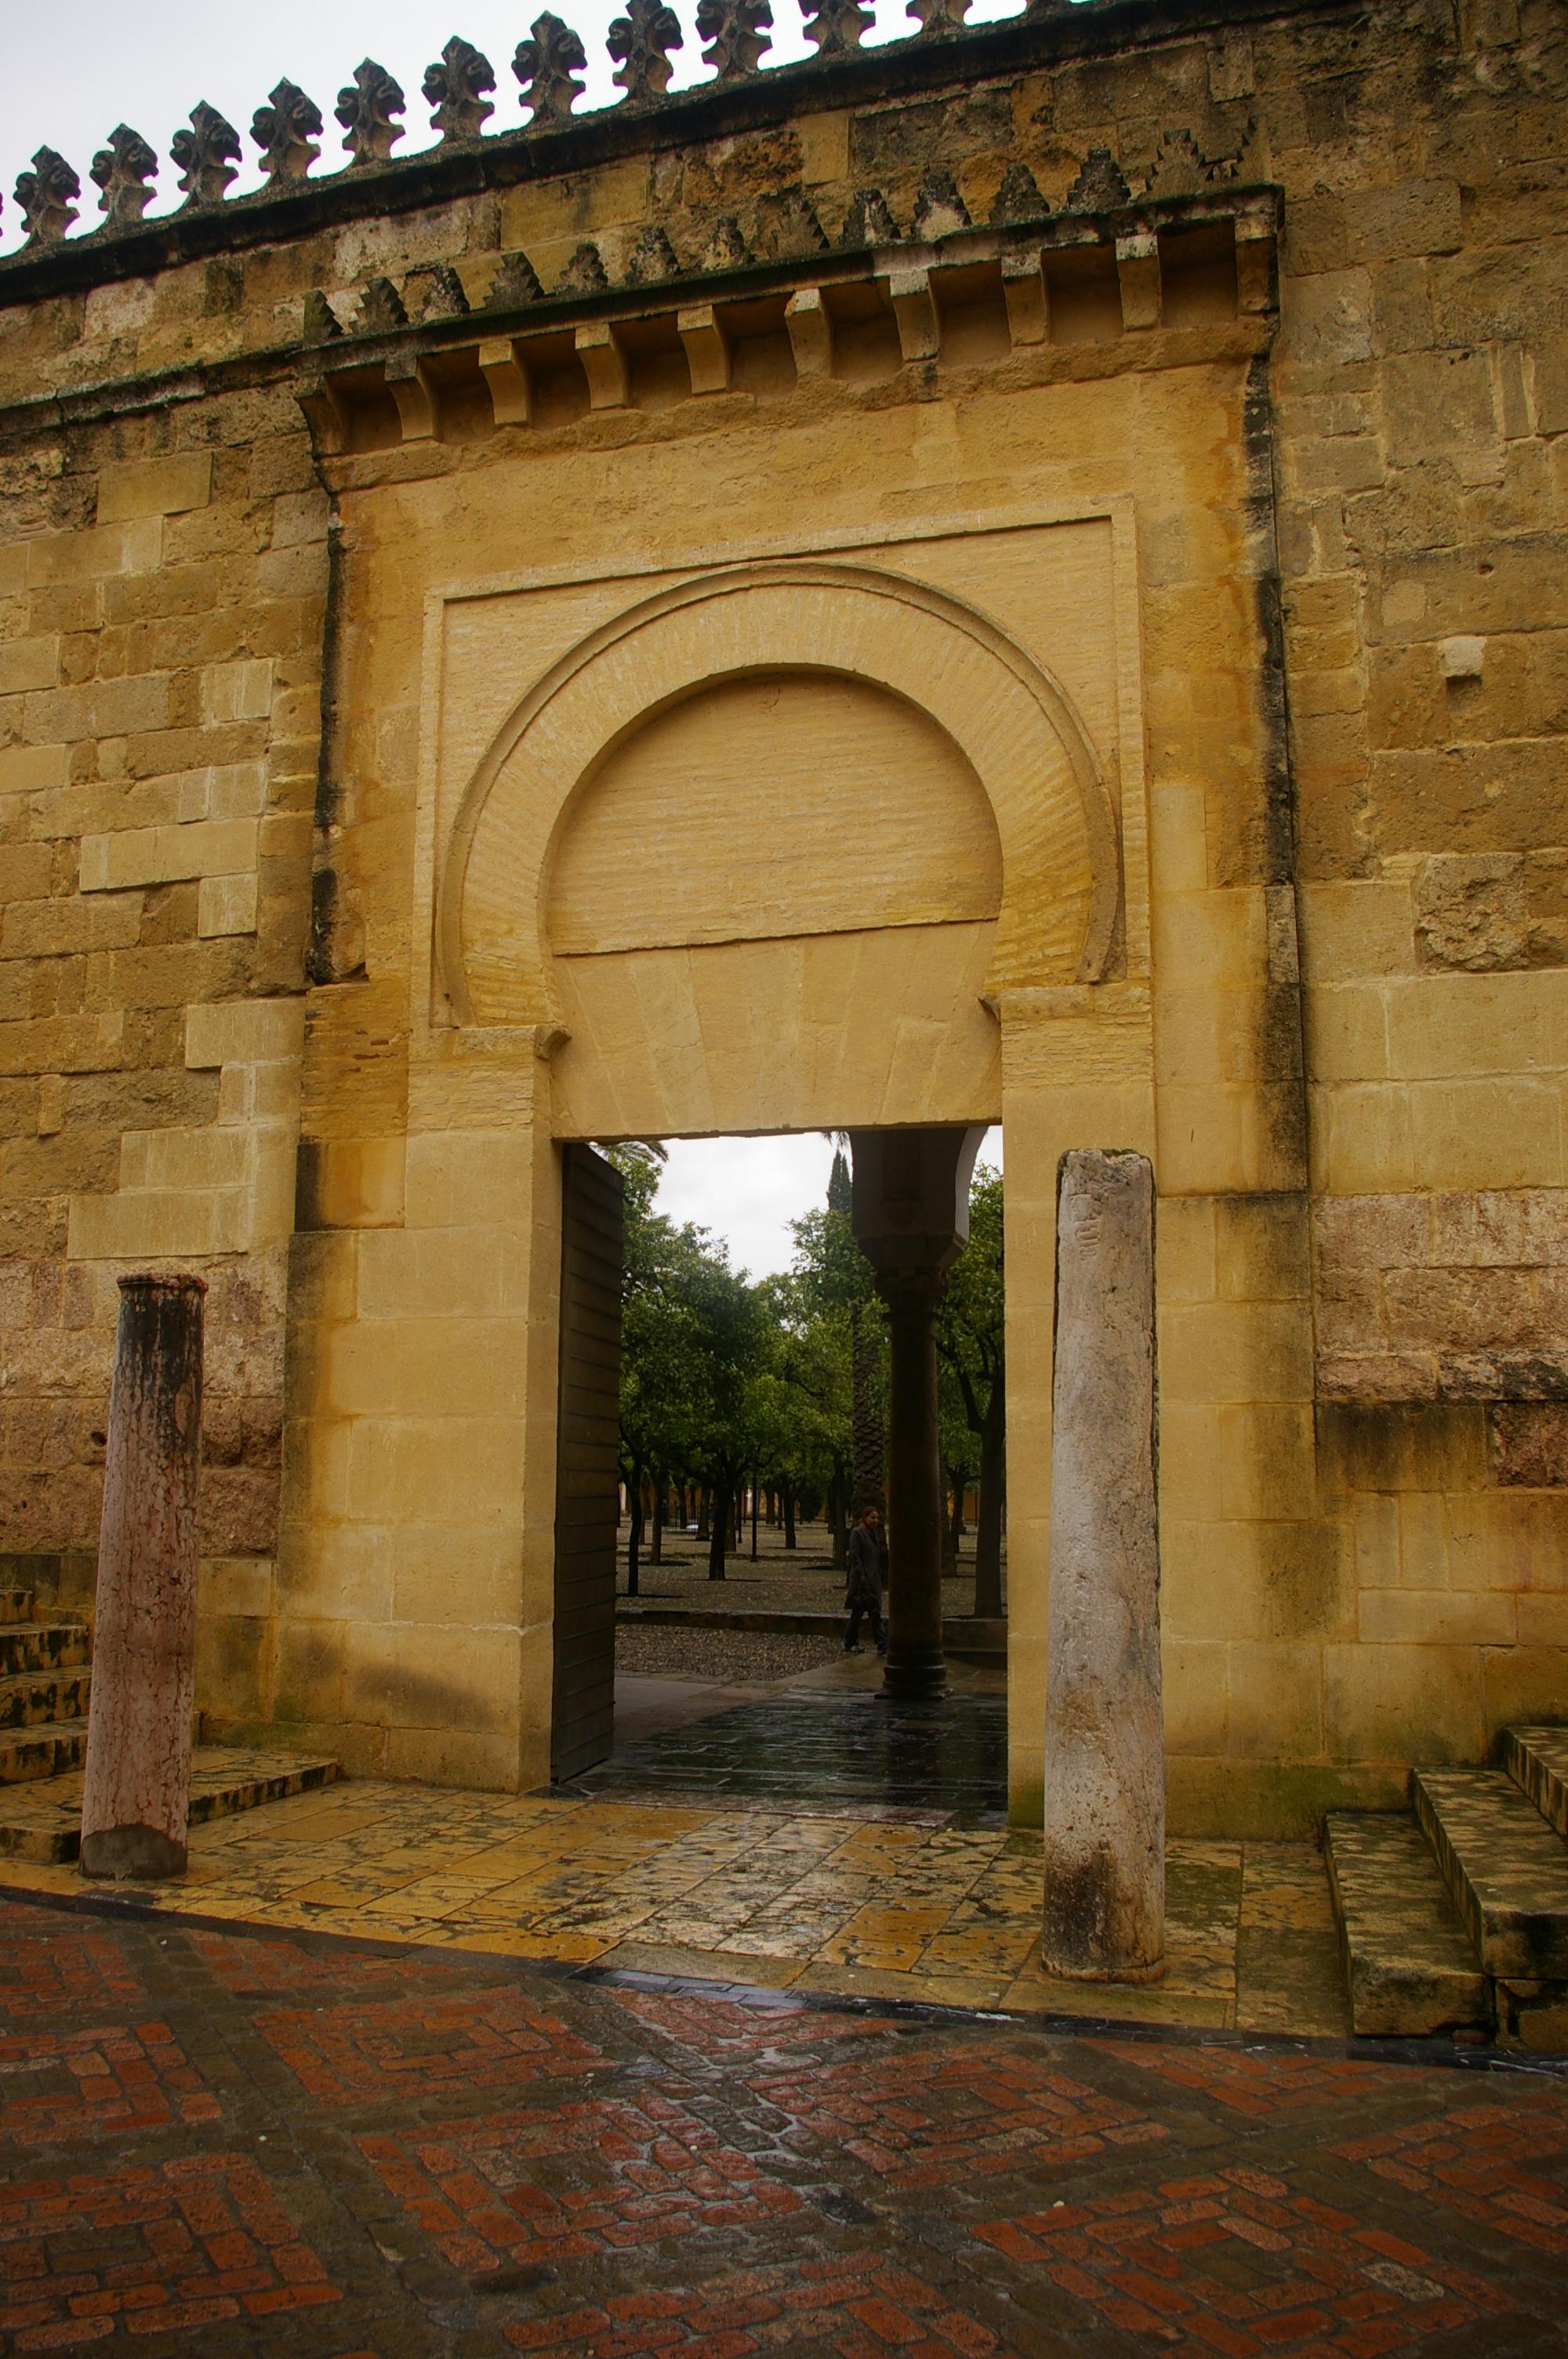 File Puerta De Los Deanes De La Mezquita De C Rdoba